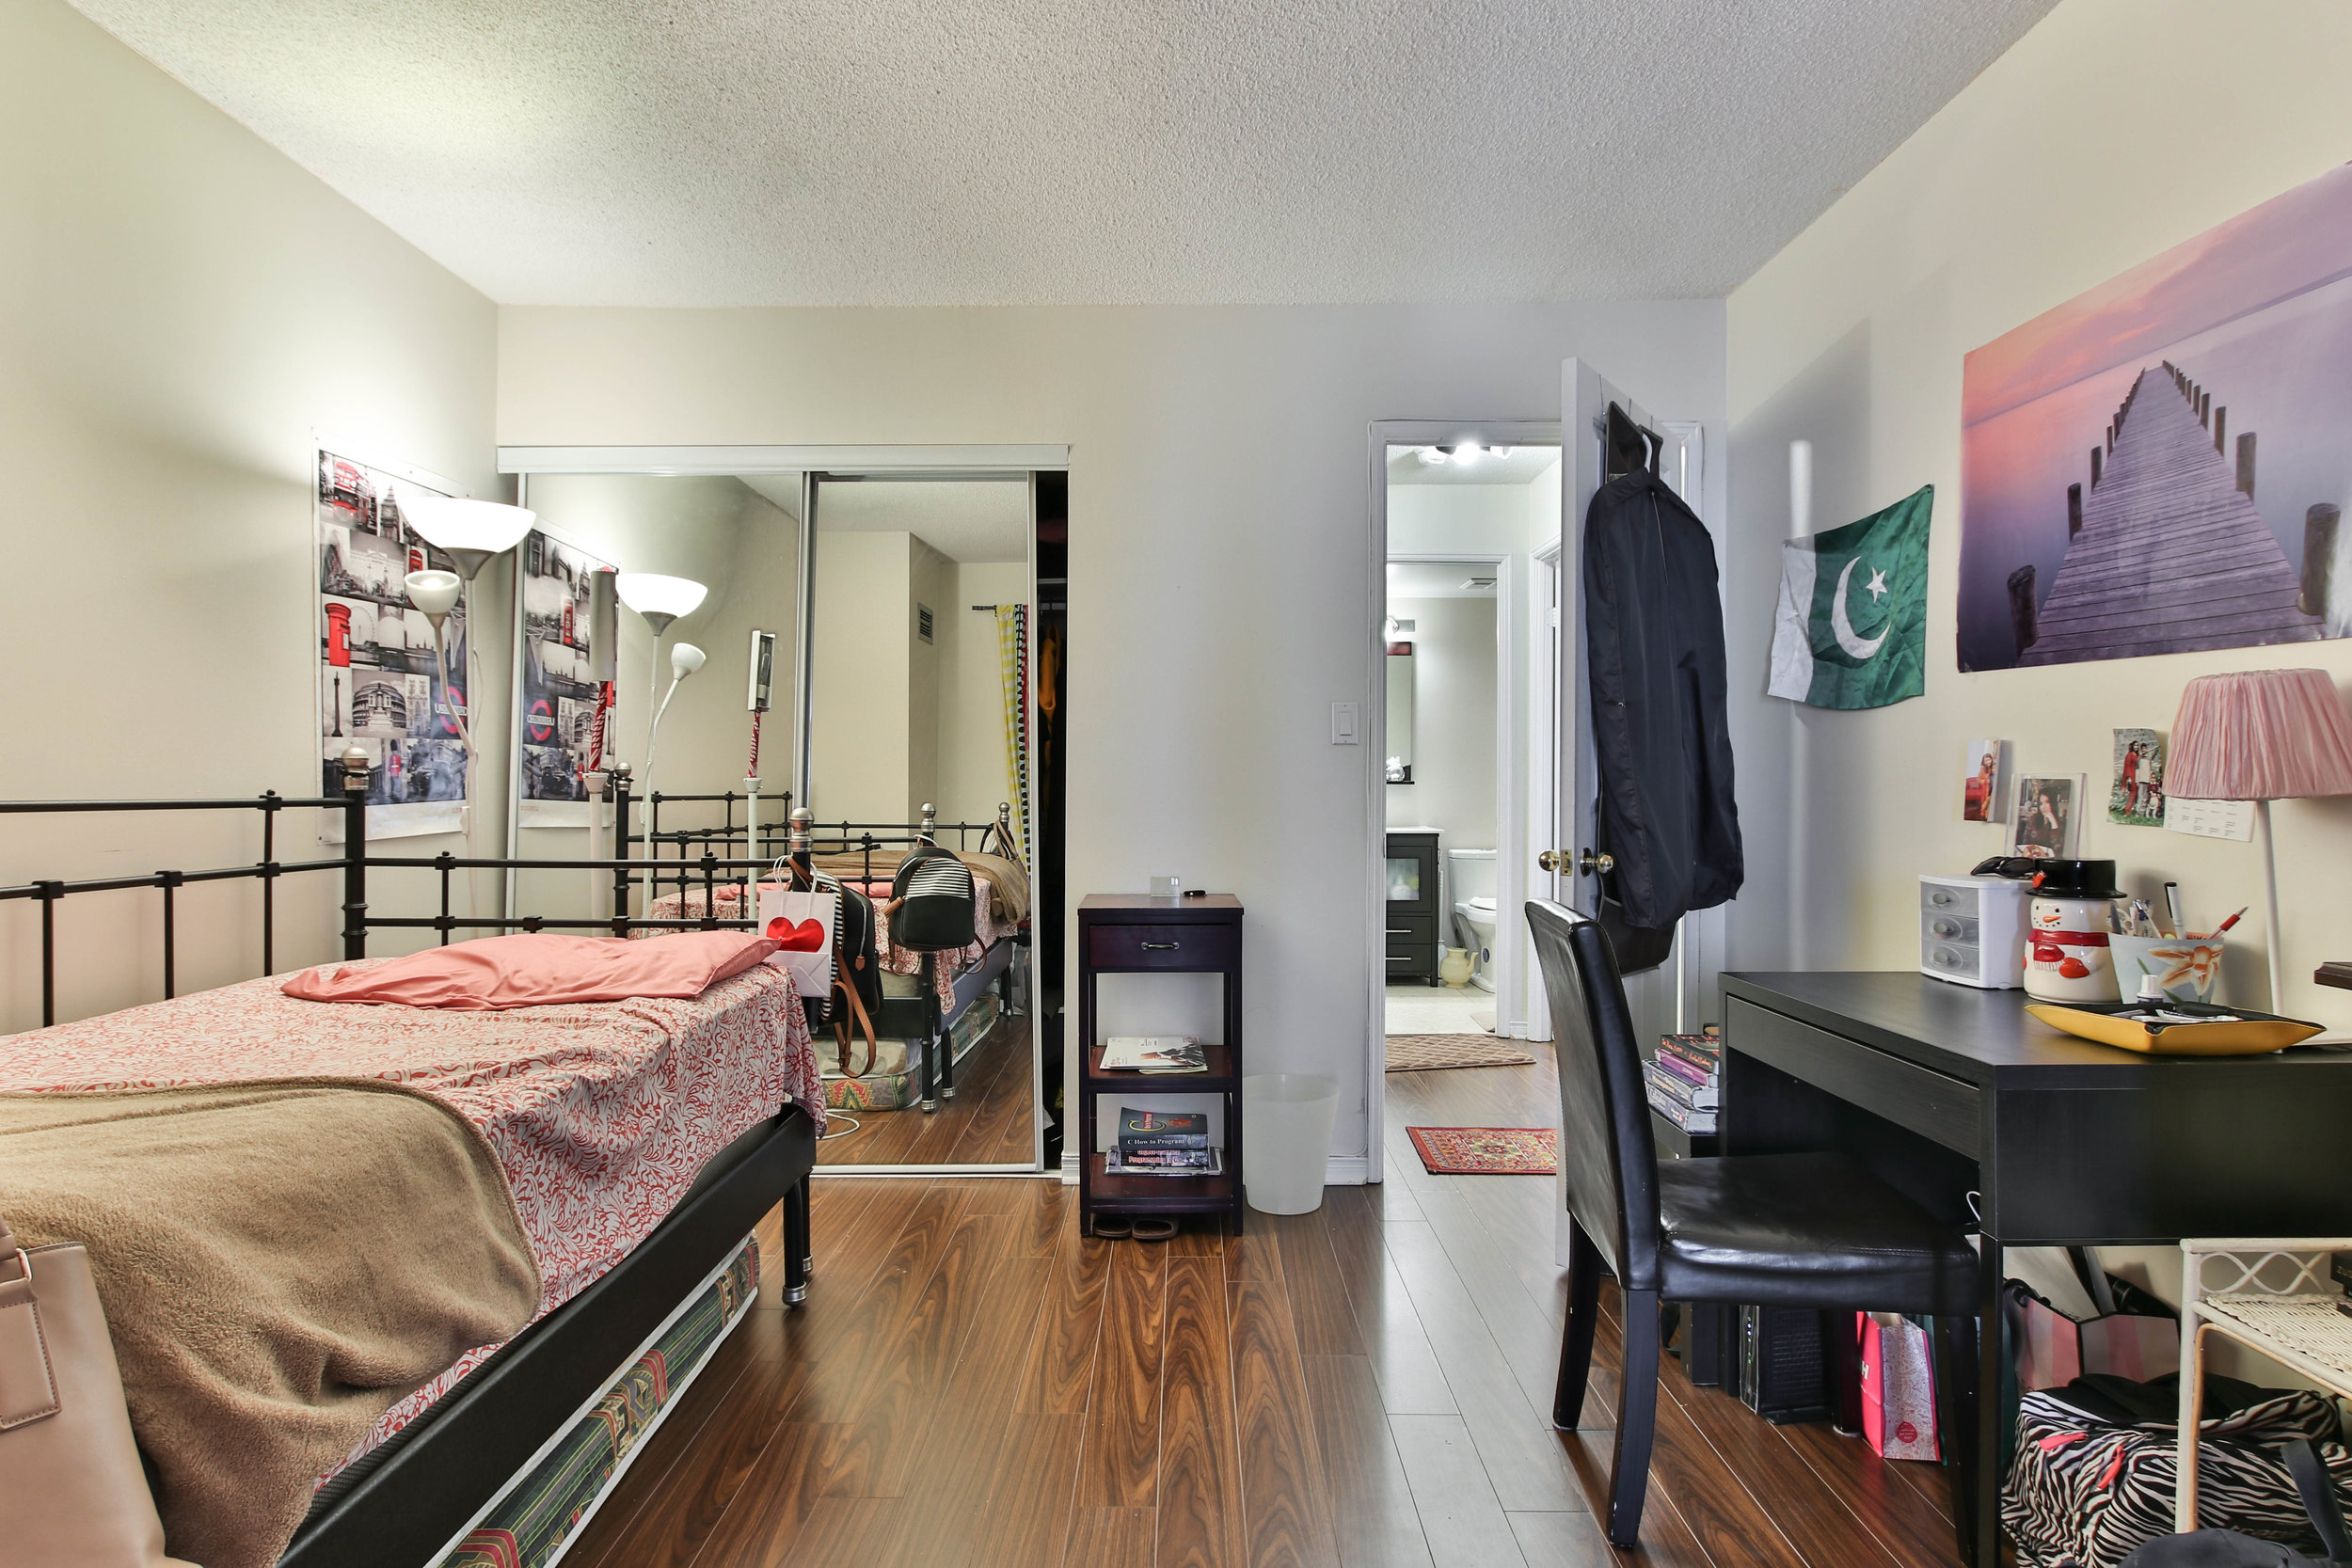 17_Bedroom-3289.jpg